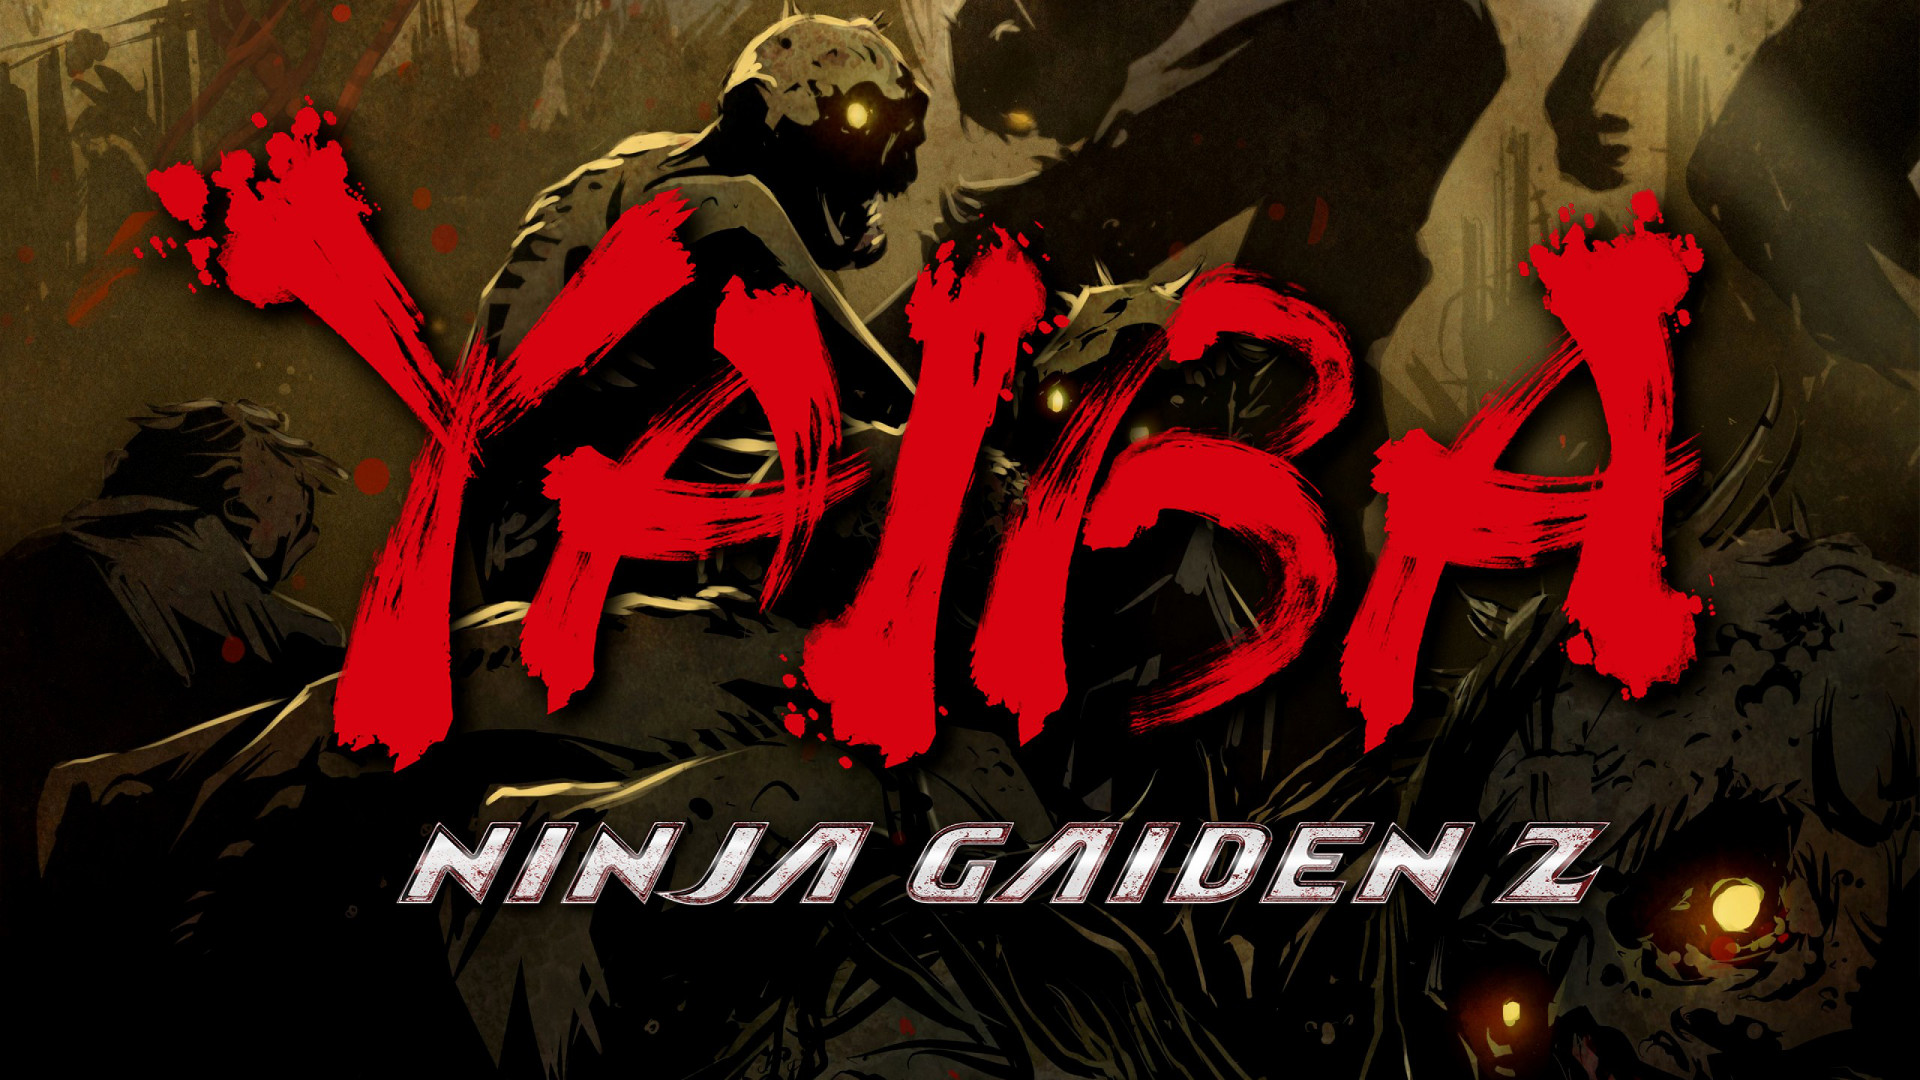 yaiba-ninja-gaiden-z feat